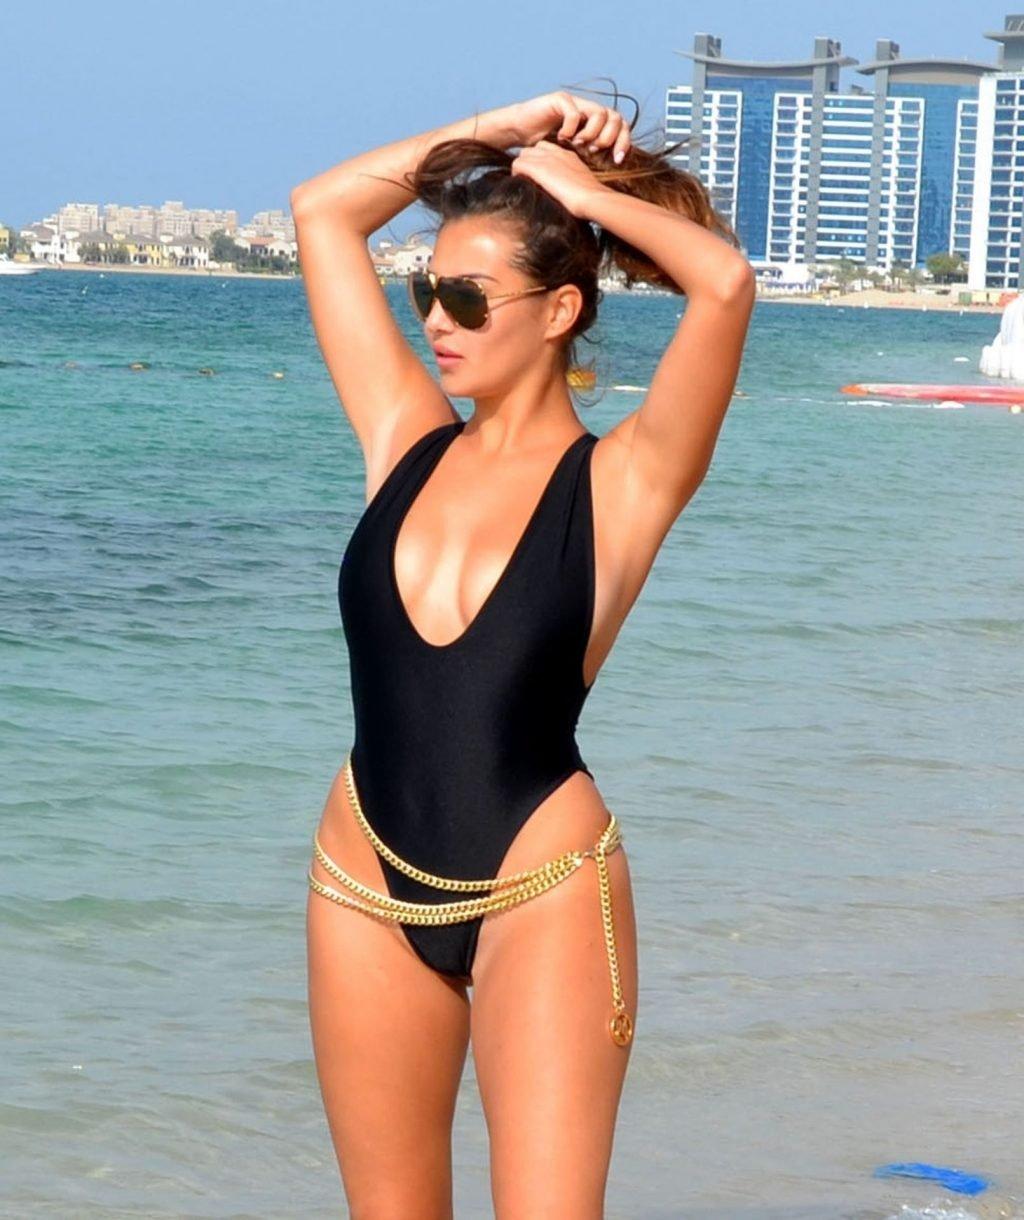 Chloe Goodman Sexy (20 New Photos)